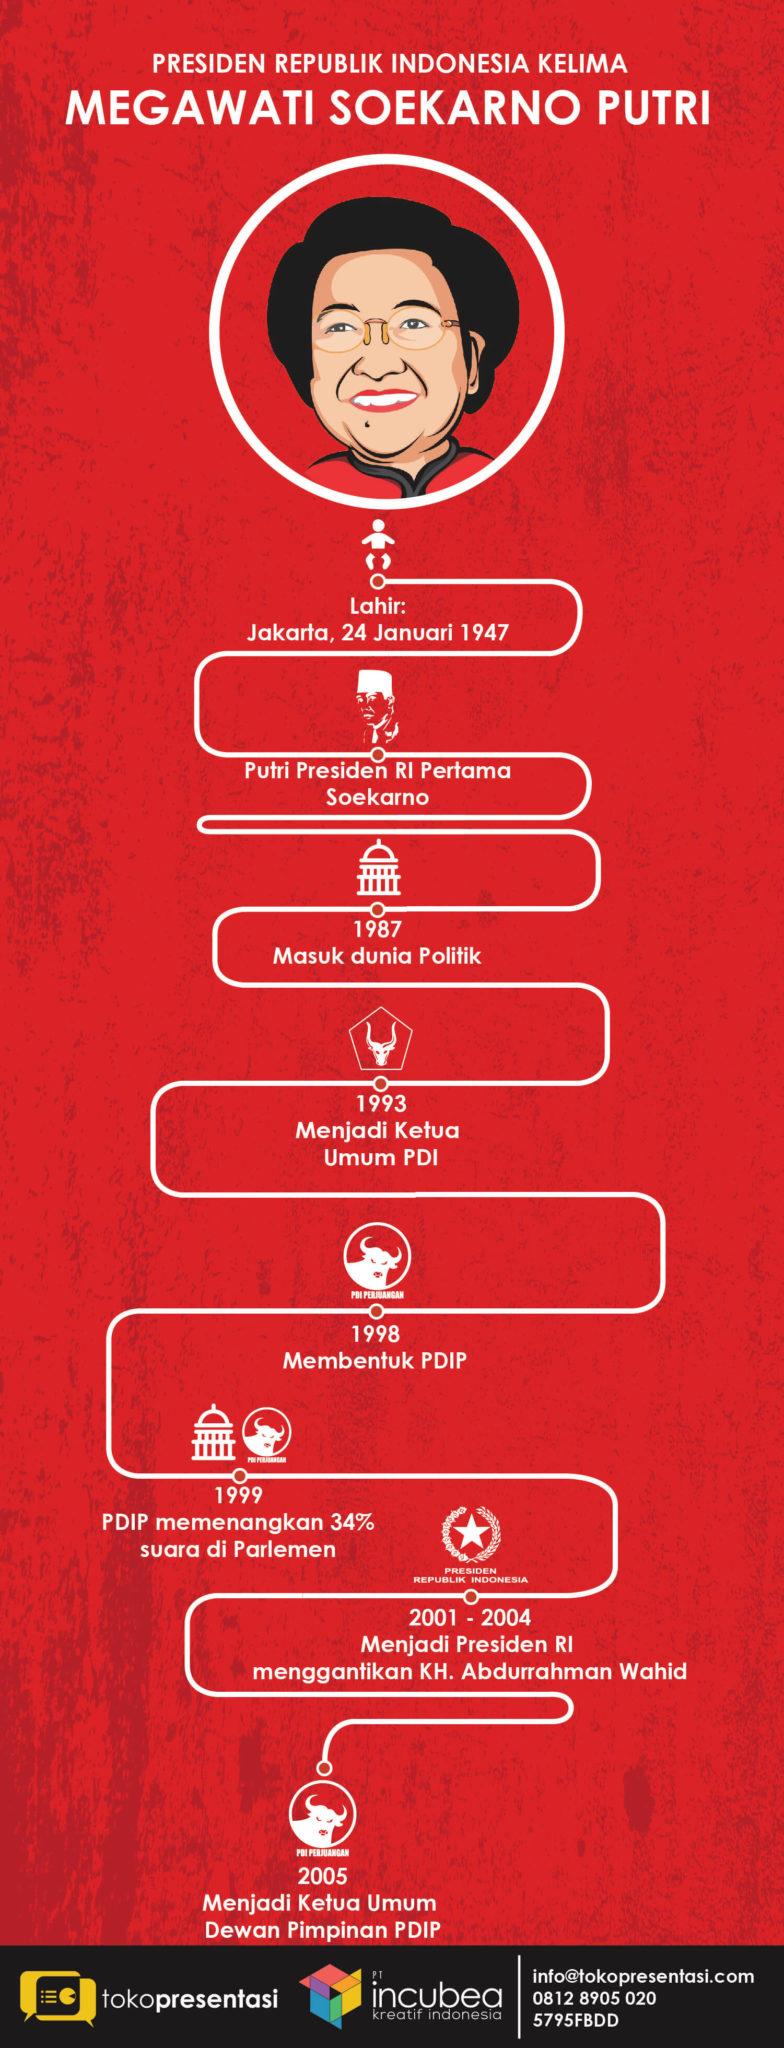 Infografis Presiden RI kelima Megawati Soekarno Putri jasa infografis tokopresentasi-01